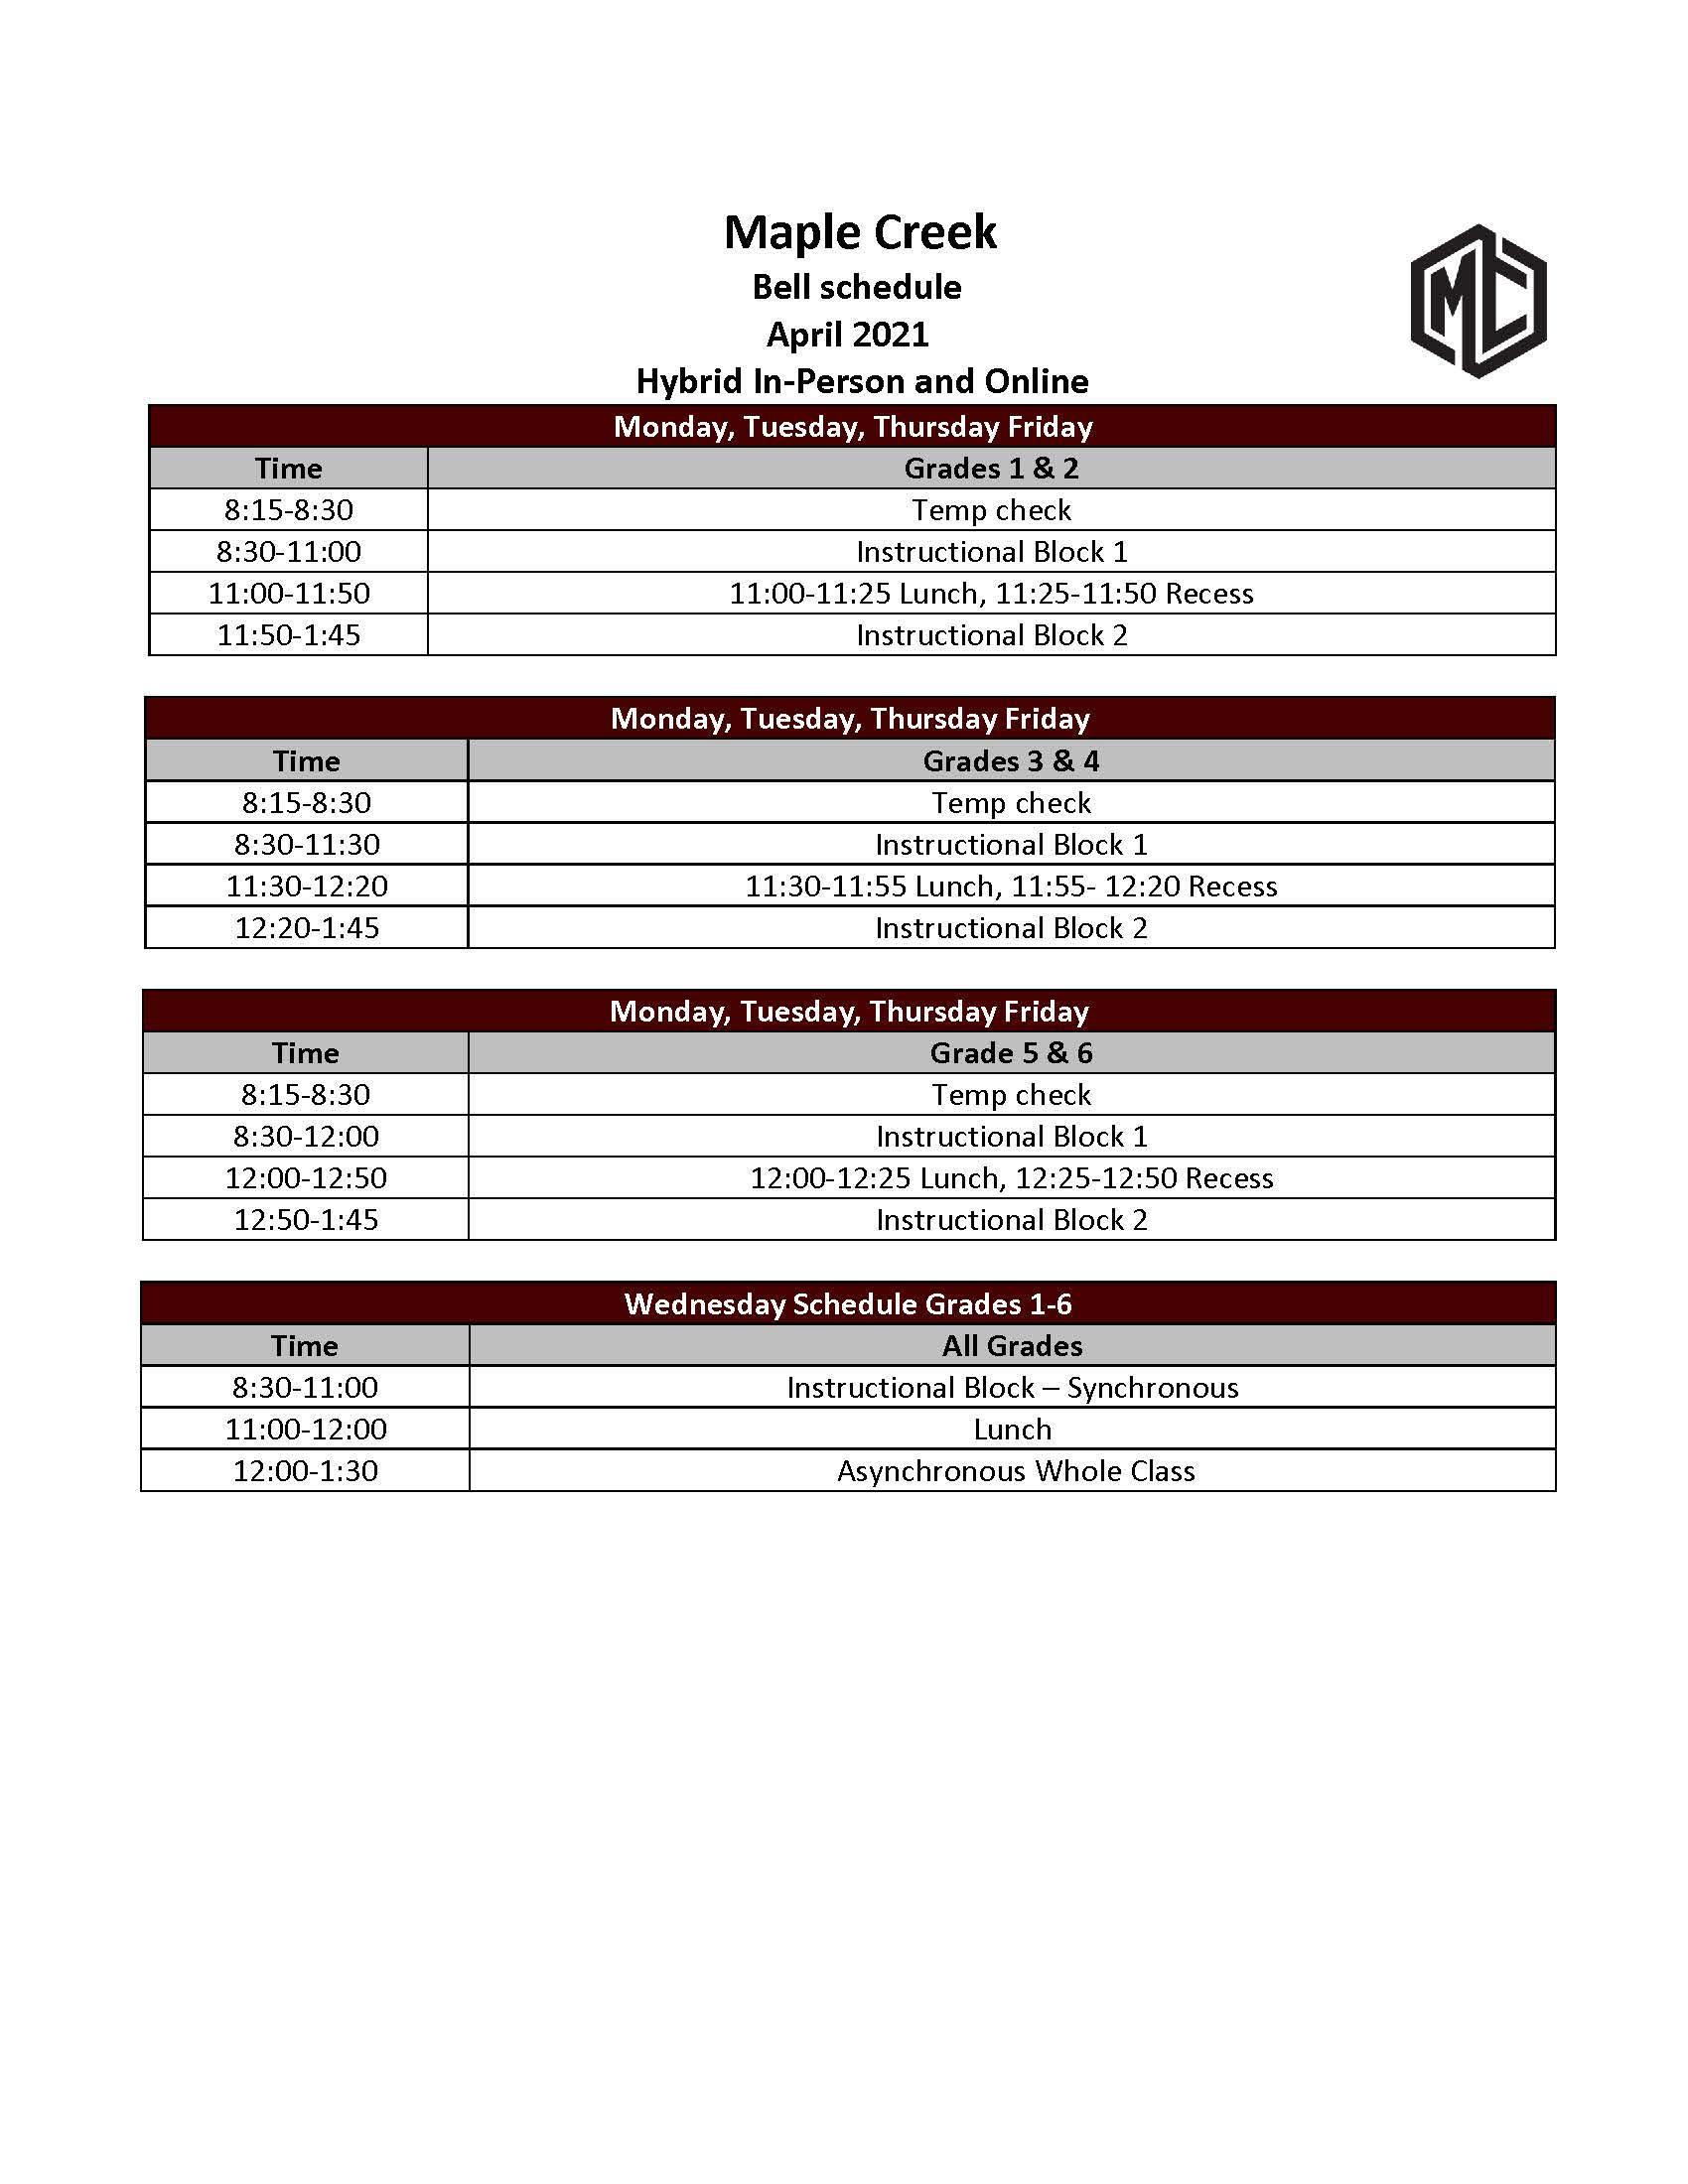 Bell Schedule April 6 2021